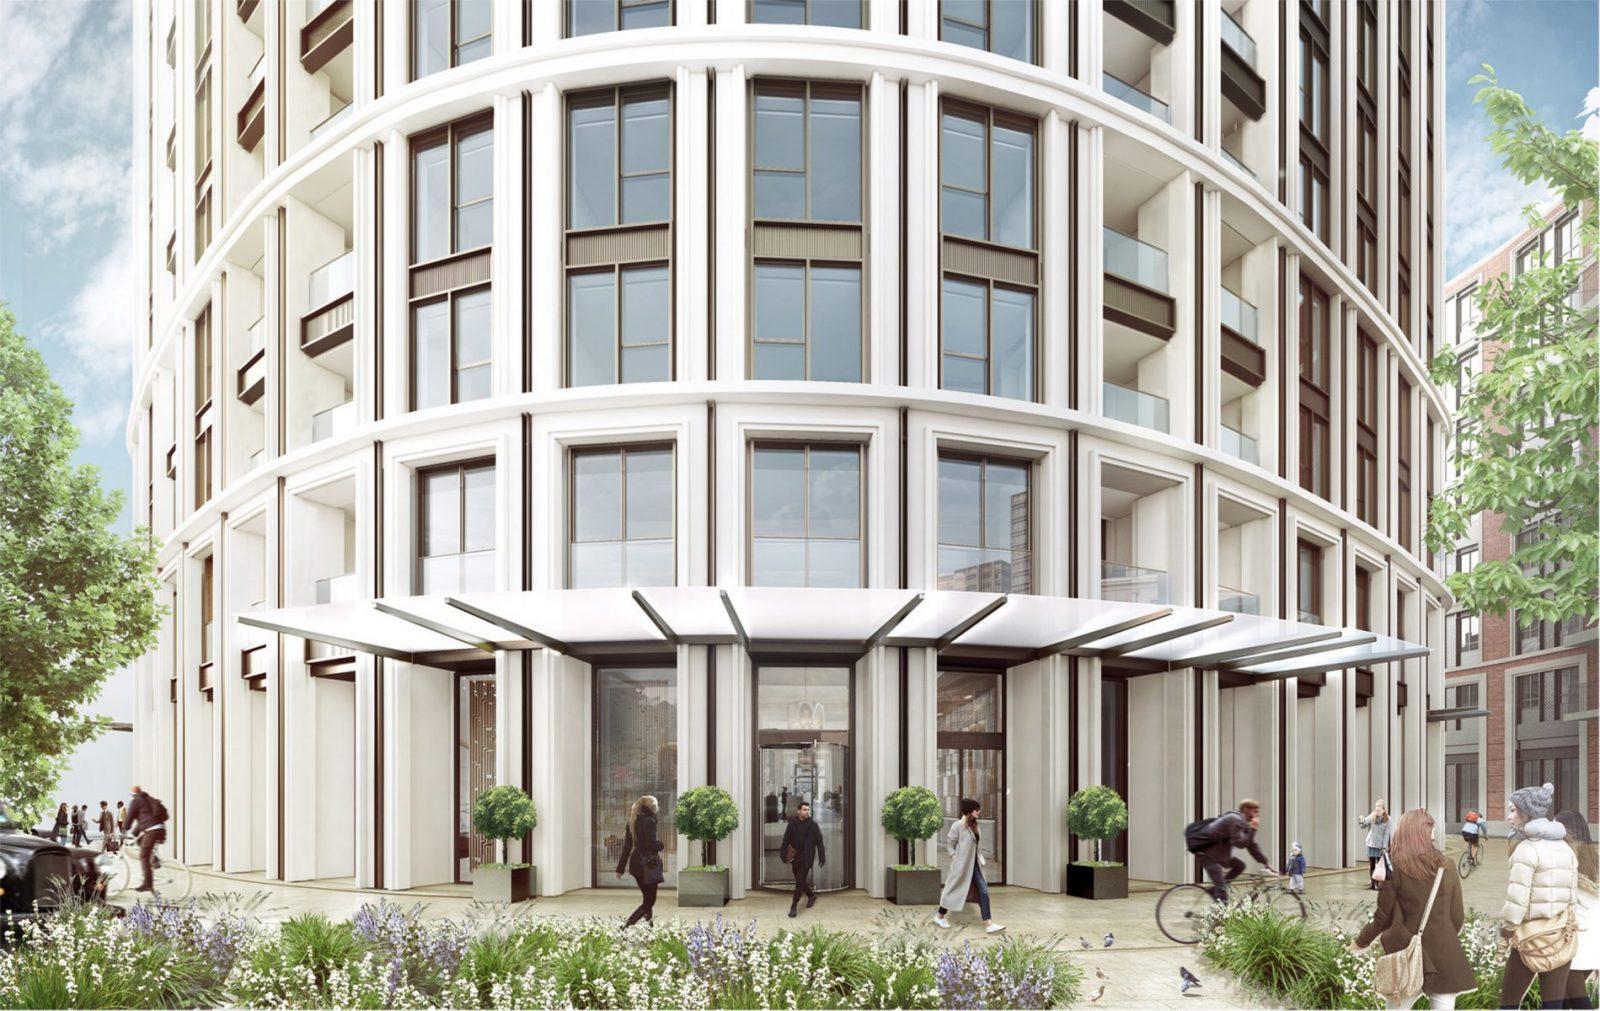 westmark tower london modern georgian architecture berkeley homes architects jersey7